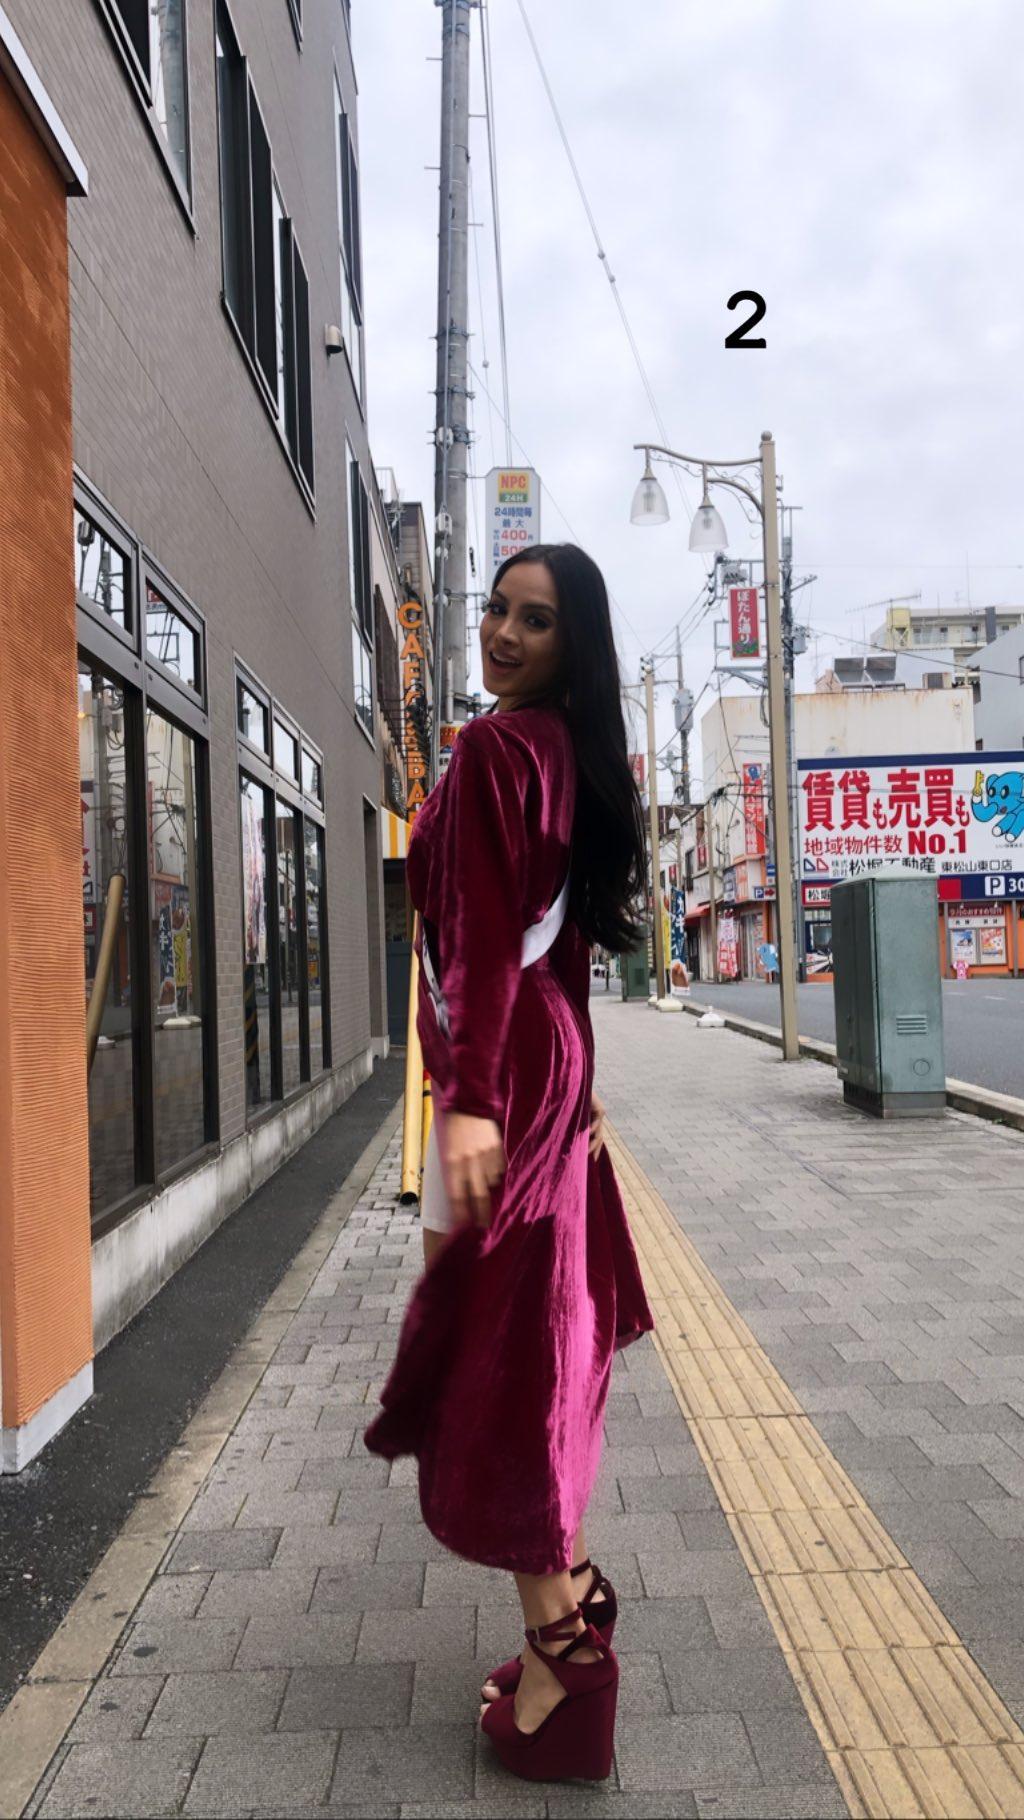 maria alejandra vengoechea, miss colombia hispanoamericana 2021/3rd runner-up de miss international 2019. - Página 6 71776710